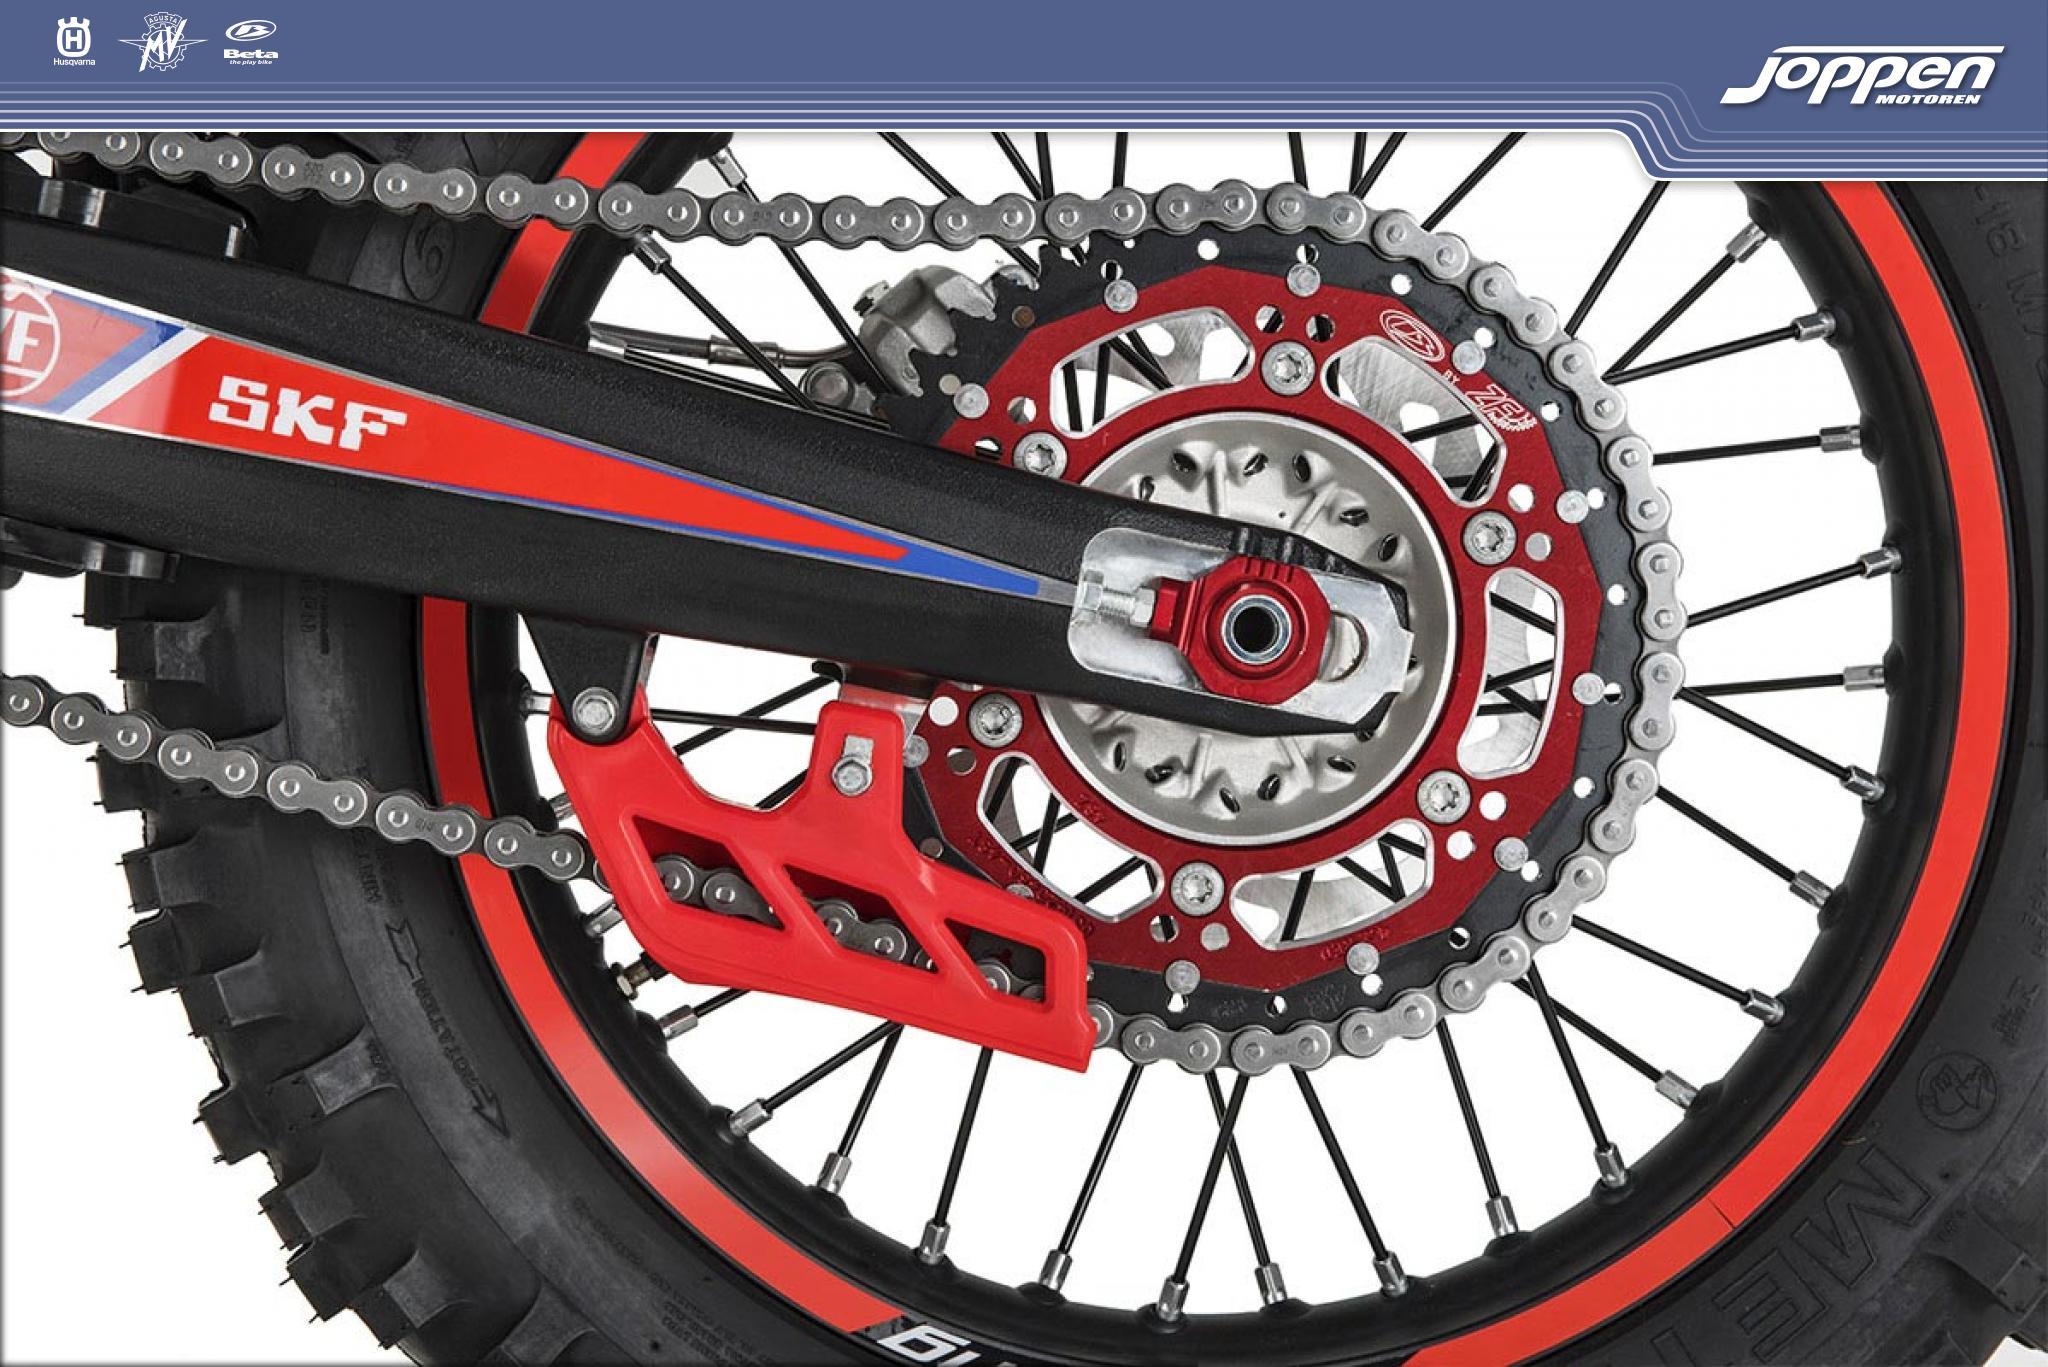 Beta RR250 2T Racing 2020 kl=blauw/rood - Off road